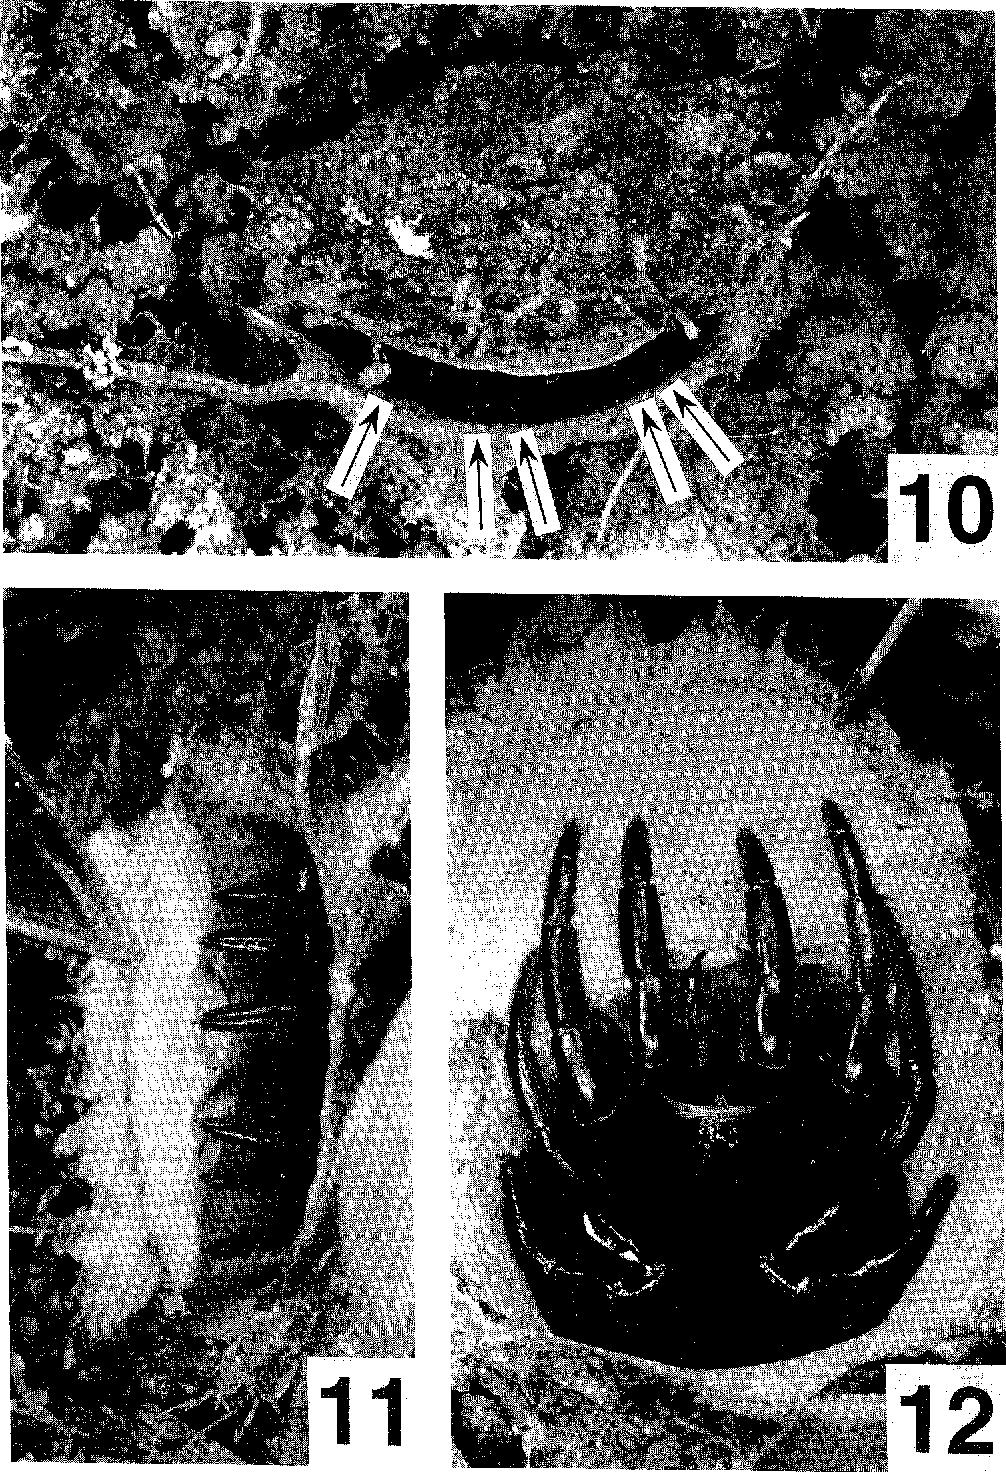 figure 10-12